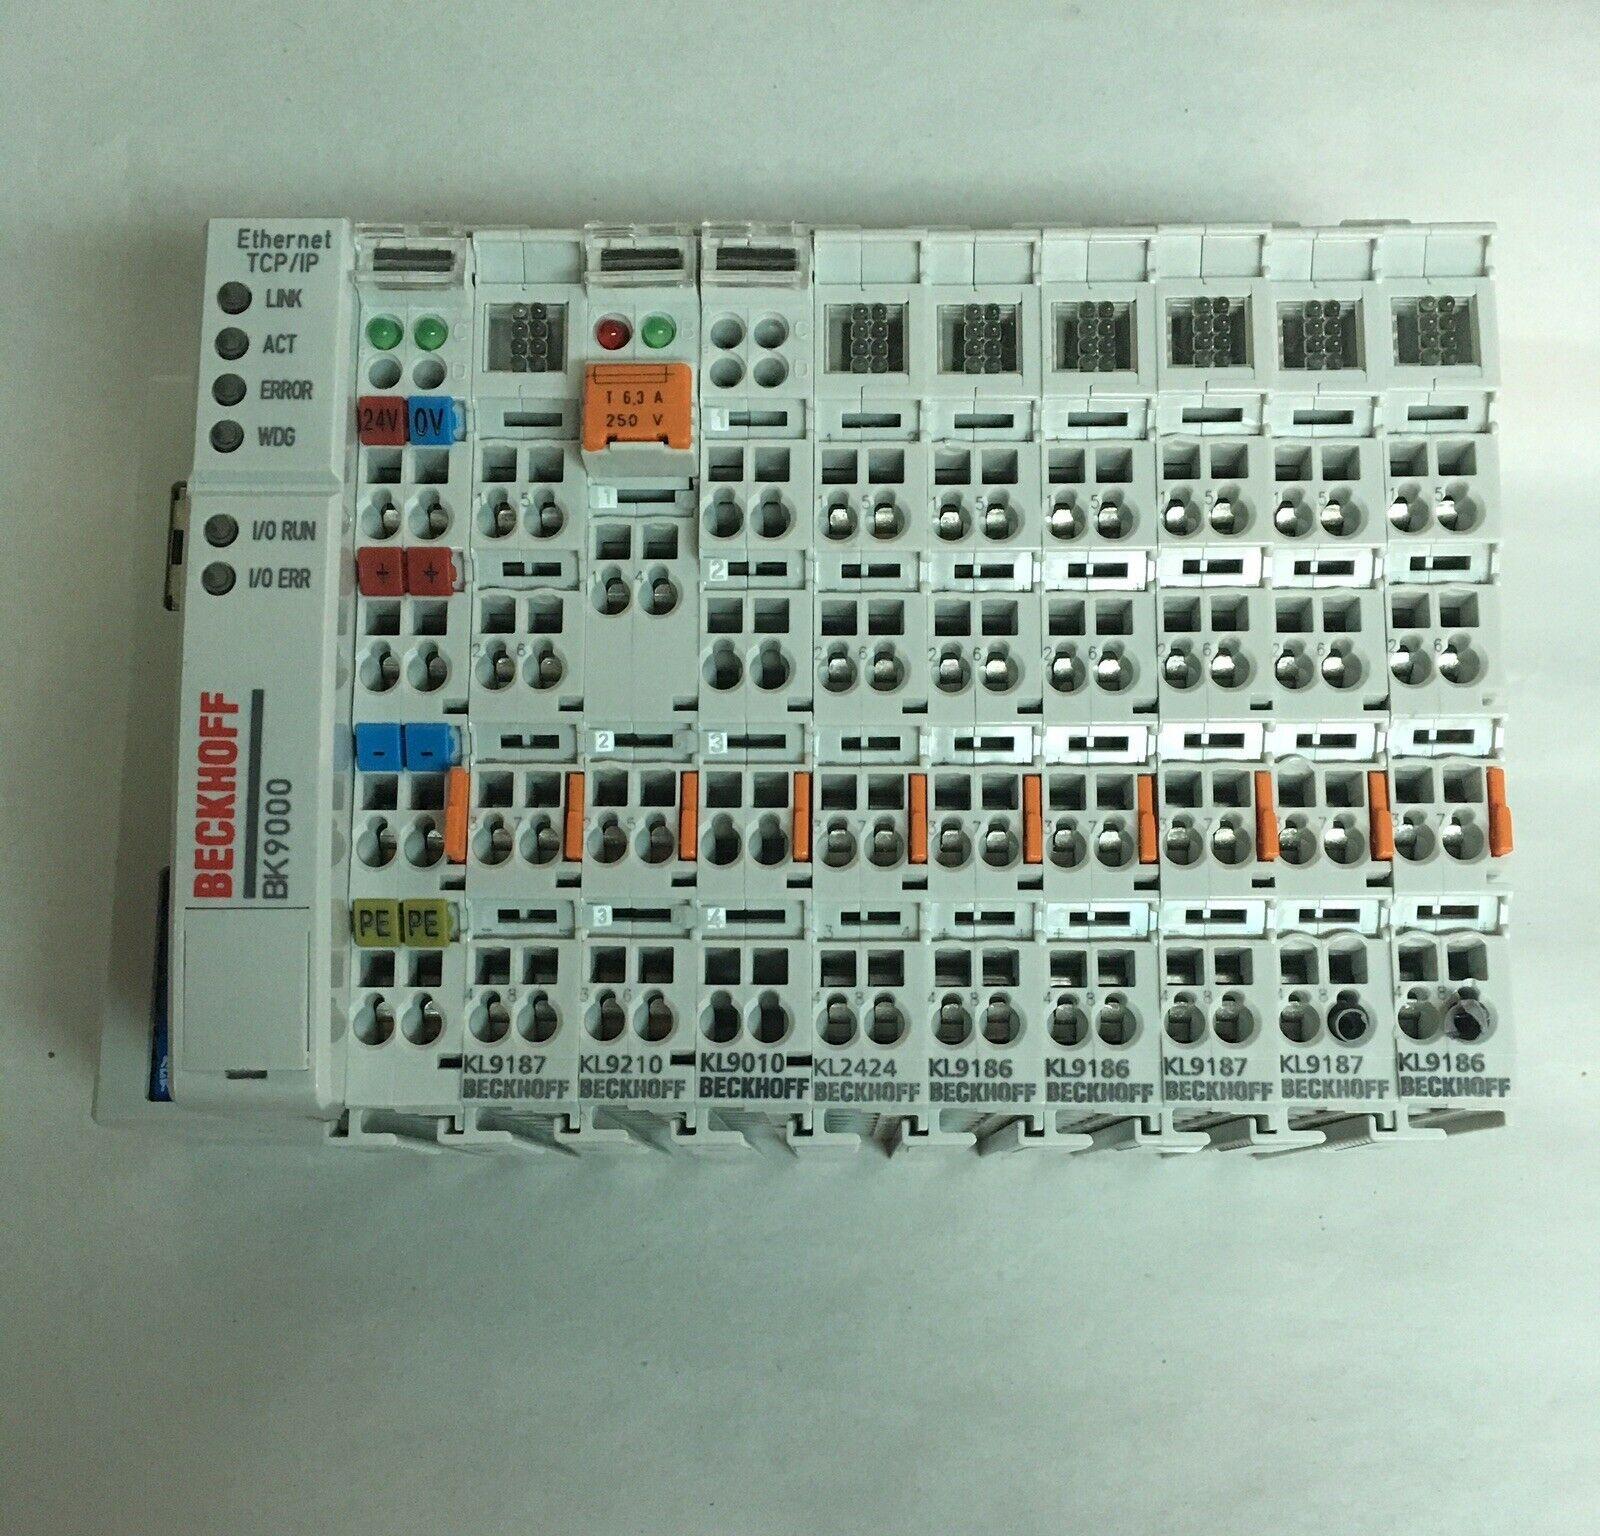 Beckhoff BK9000 PLC Terminal Module Rack